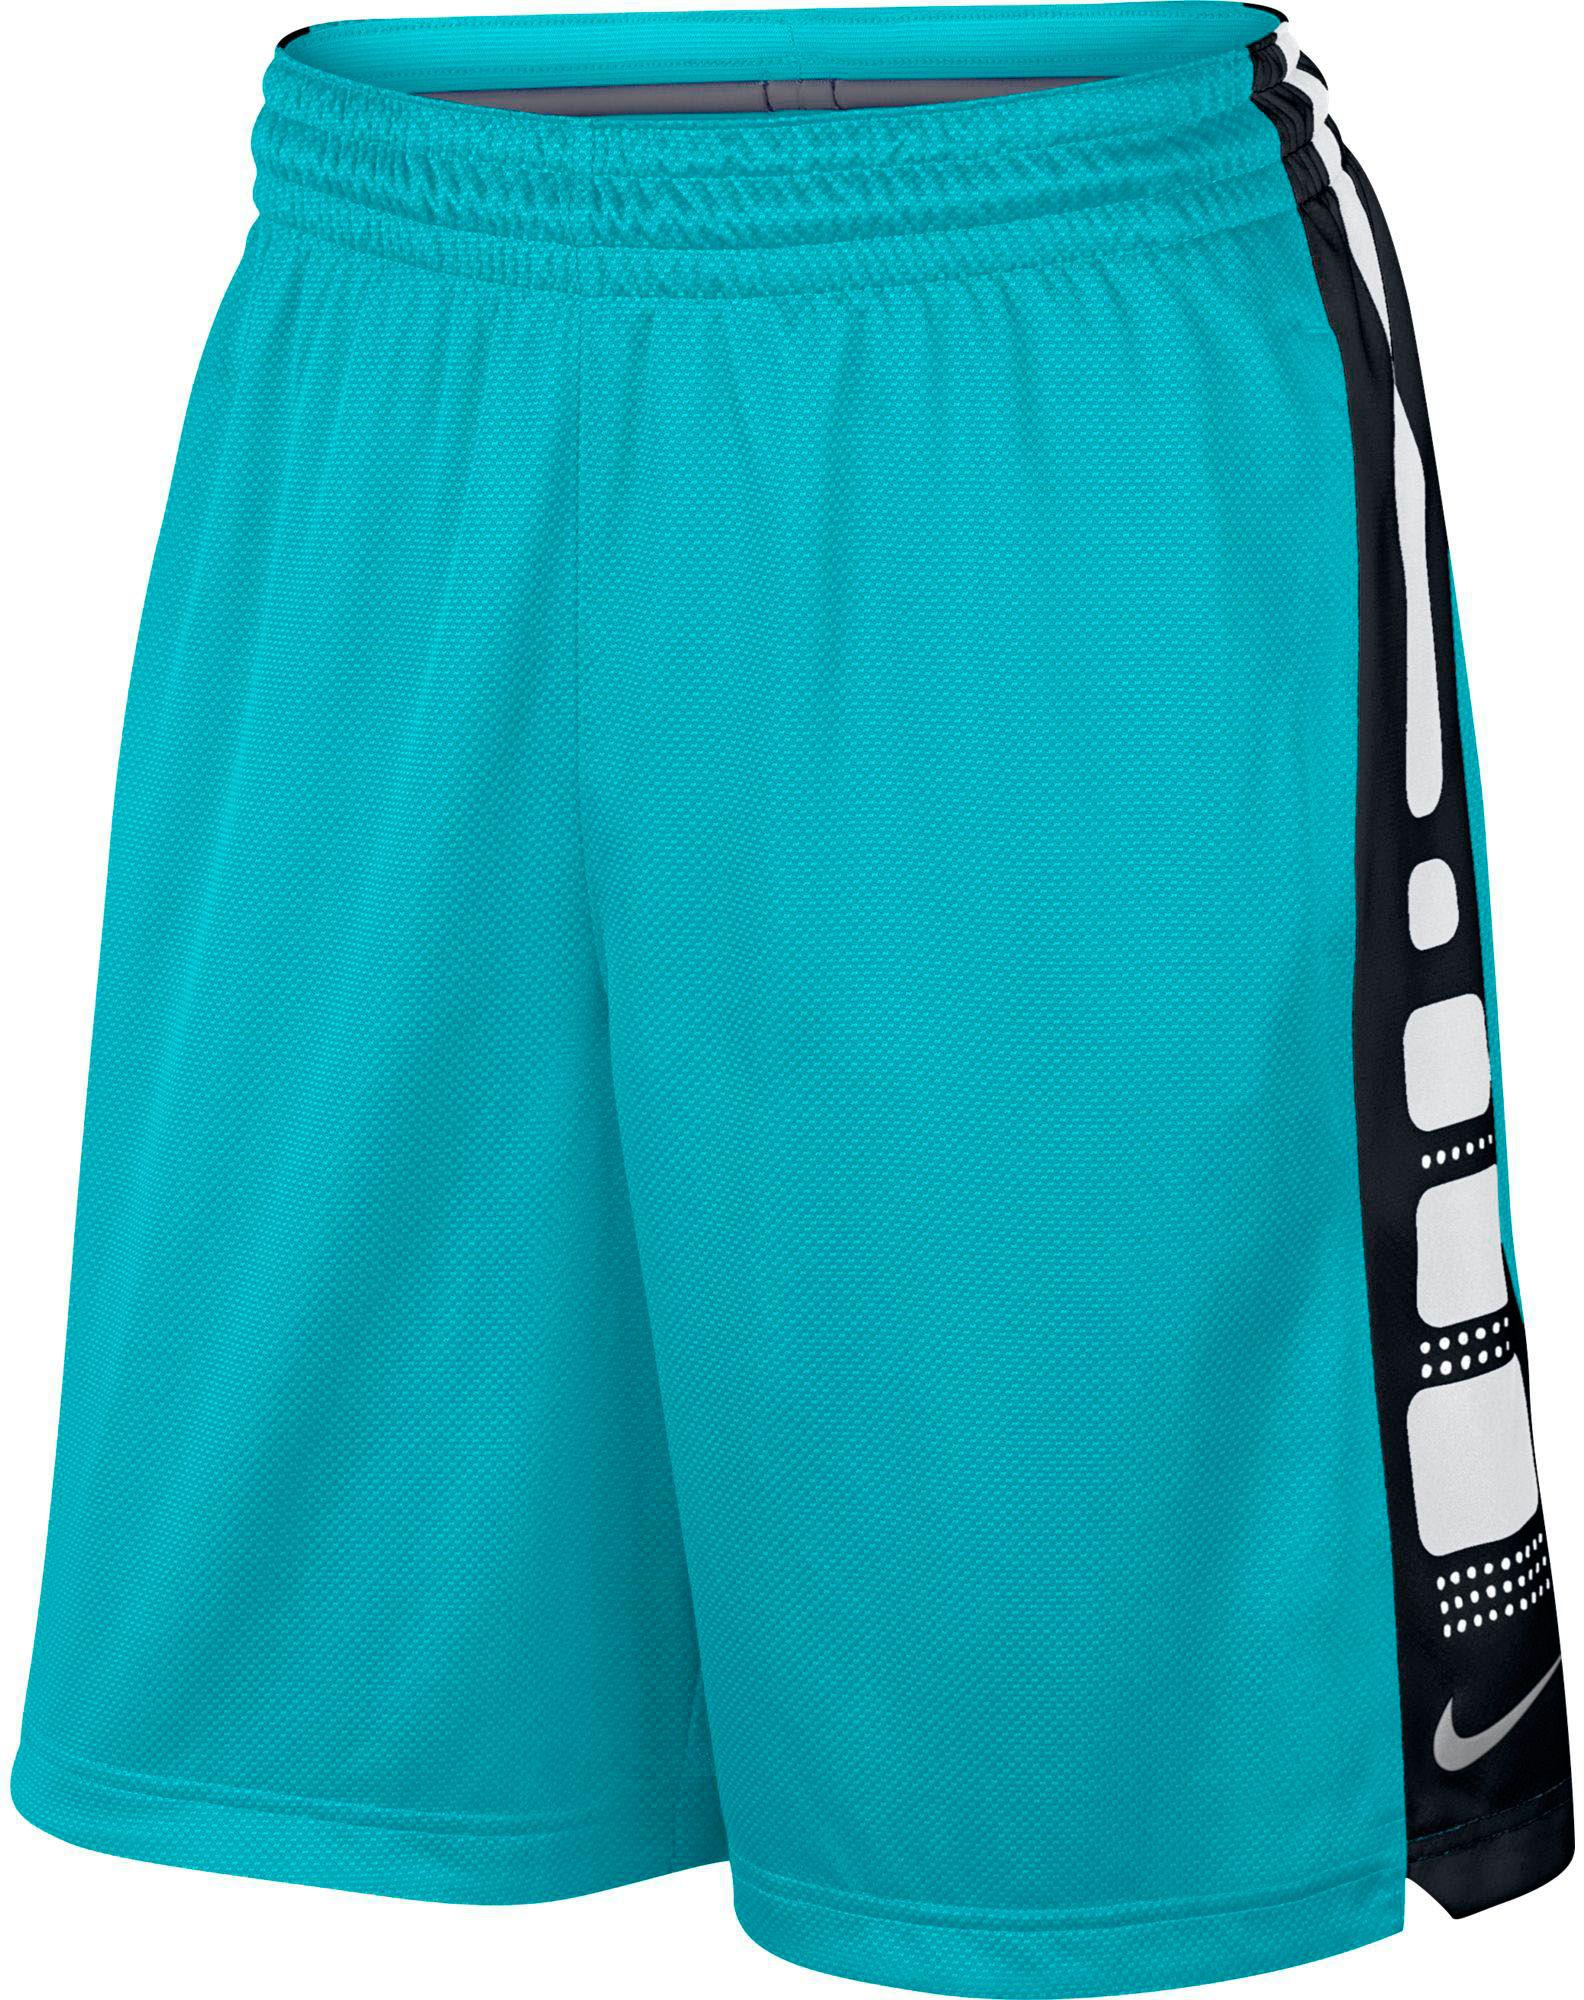 234ada6a9ba6 Lyst - Nike 9   Elite Stripe Basketball Shorts in Blue for Men